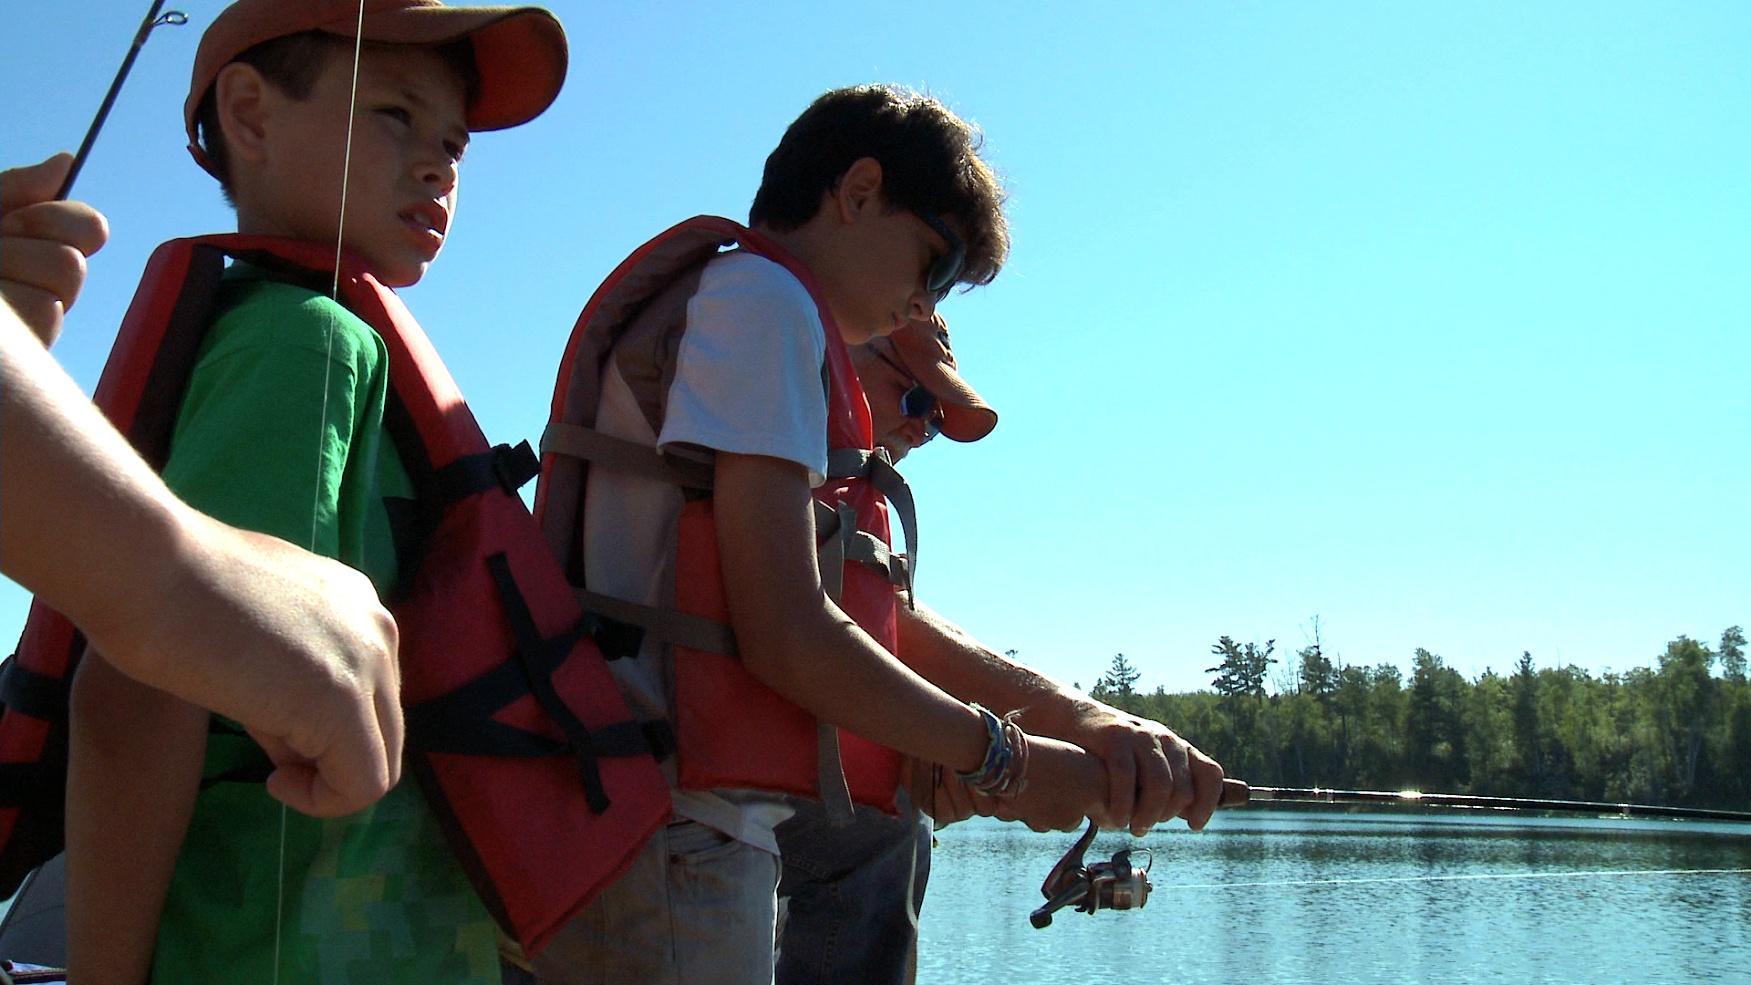 Author Michael Meuers & Darwin Sumner Fishing